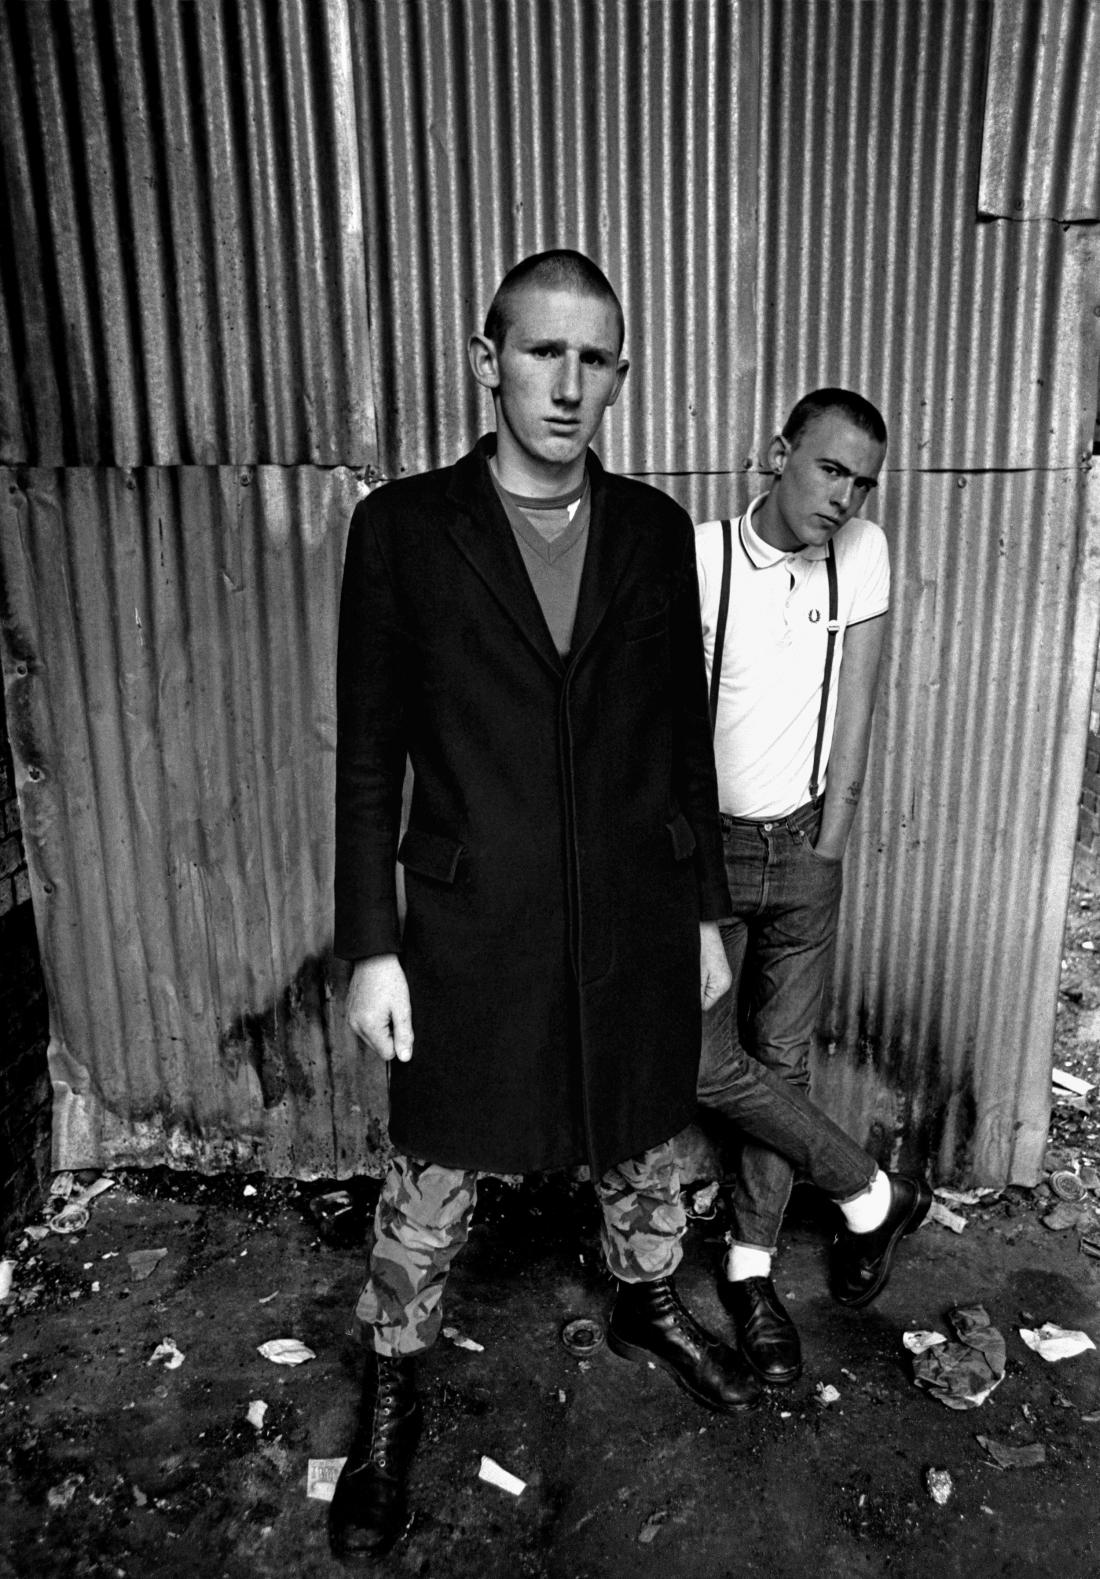 Skinheads, Petticoat Lane, East London 1979